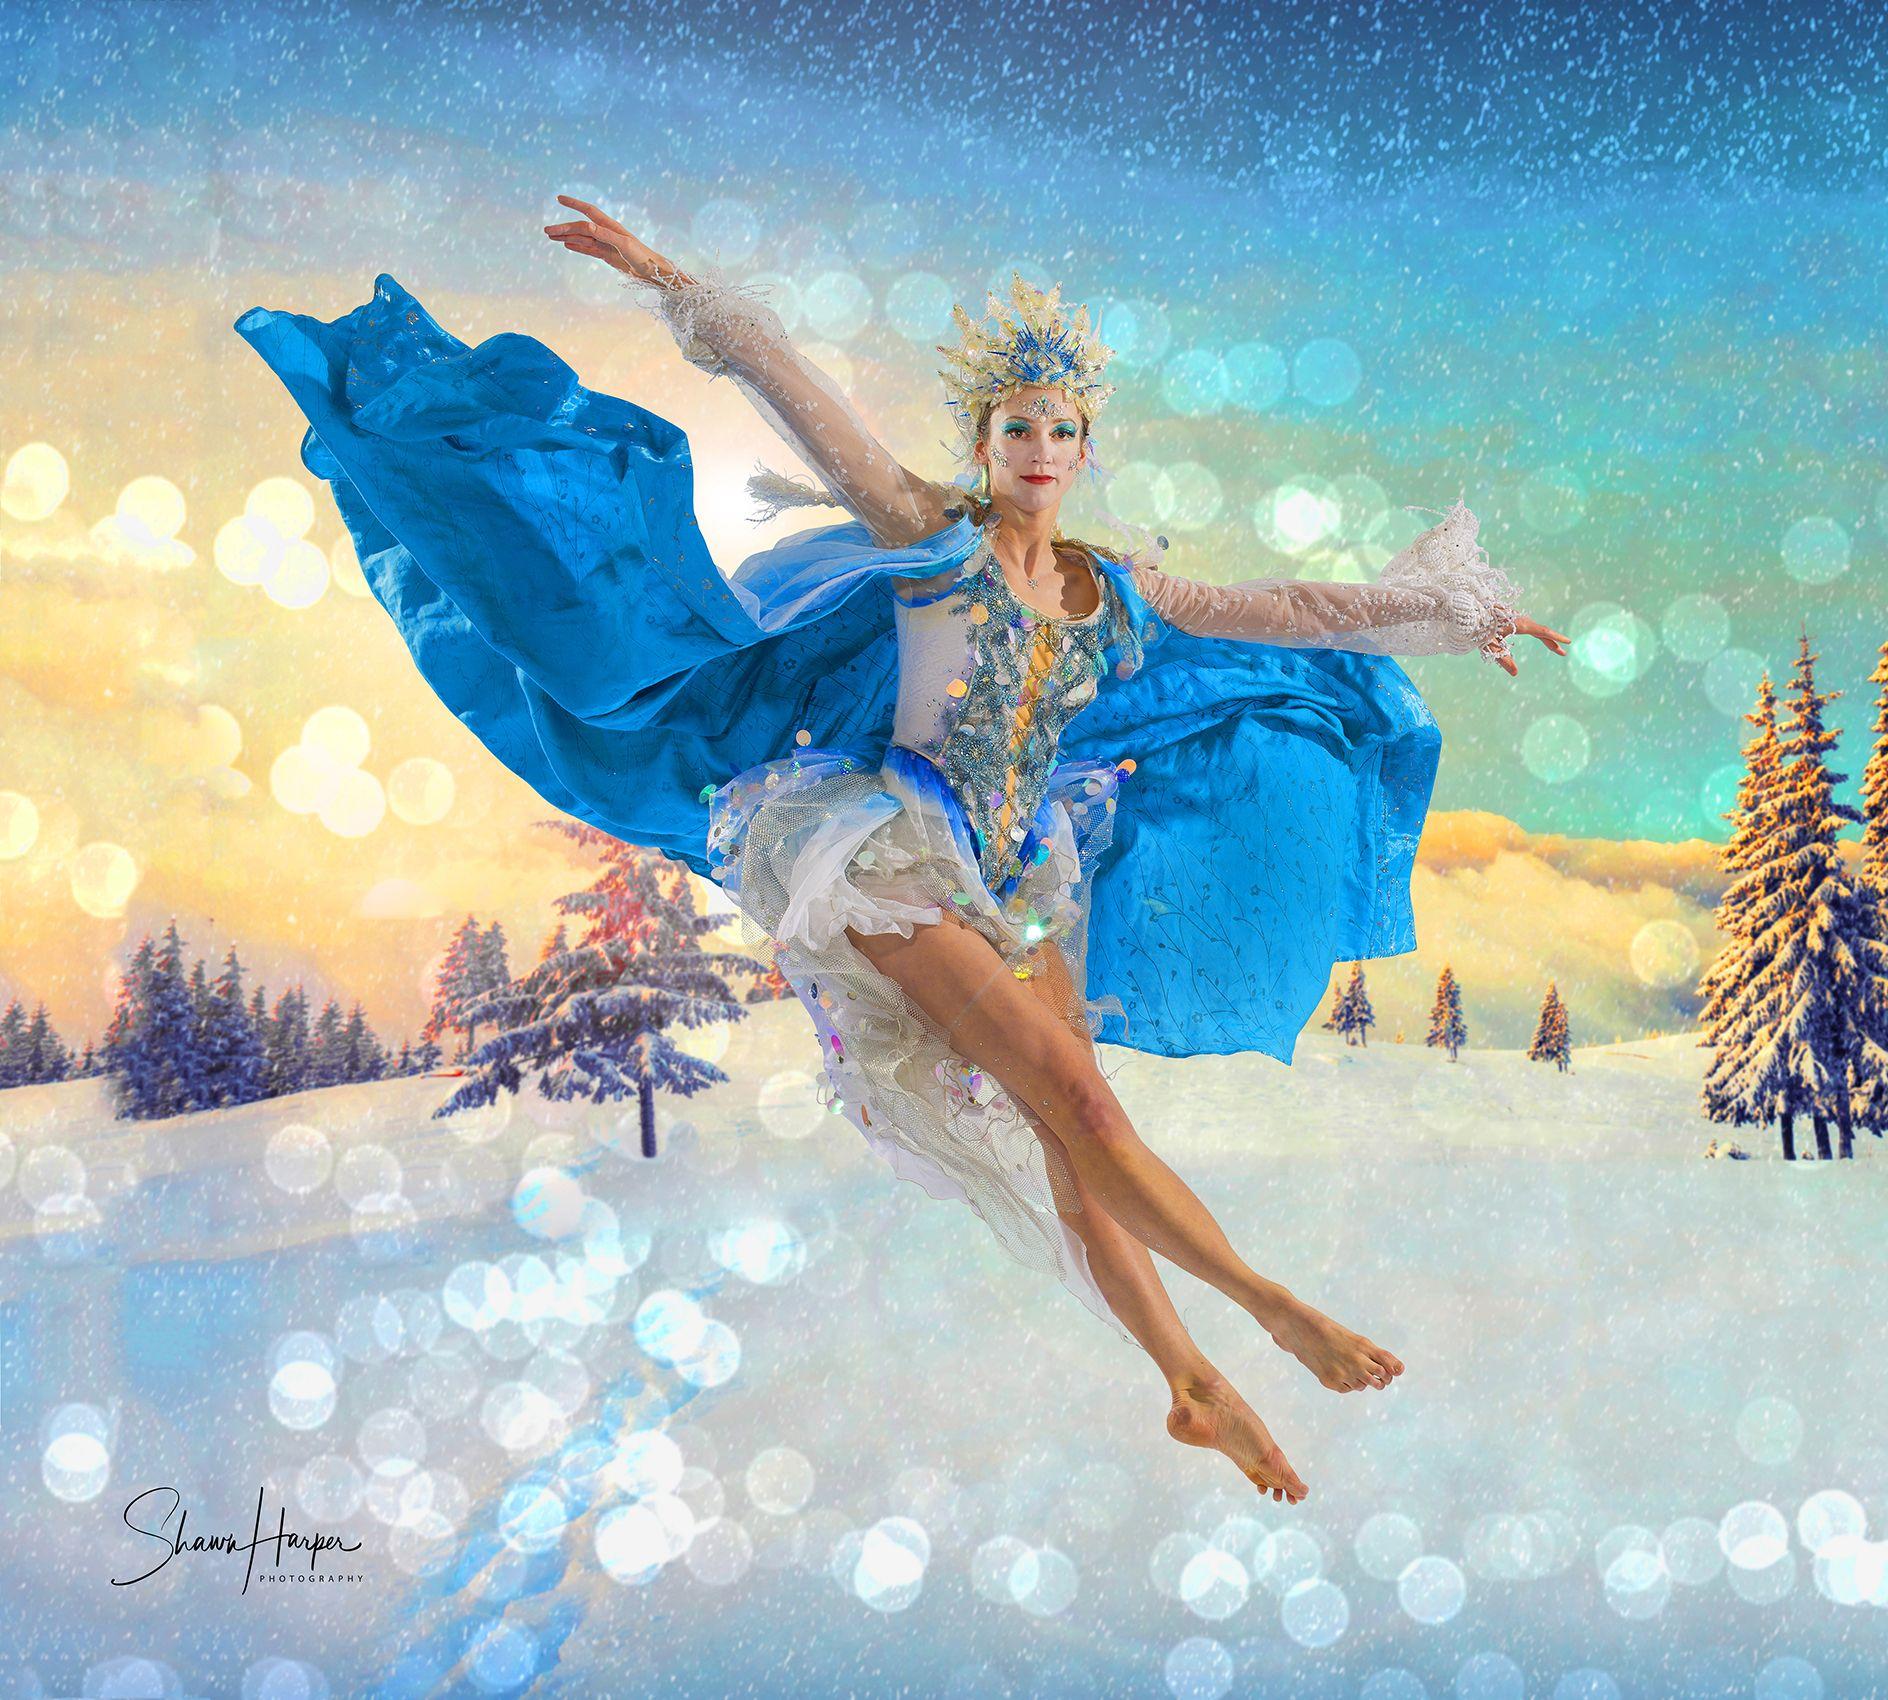 Snow_Queen_Sarah_2019_FW.jpg